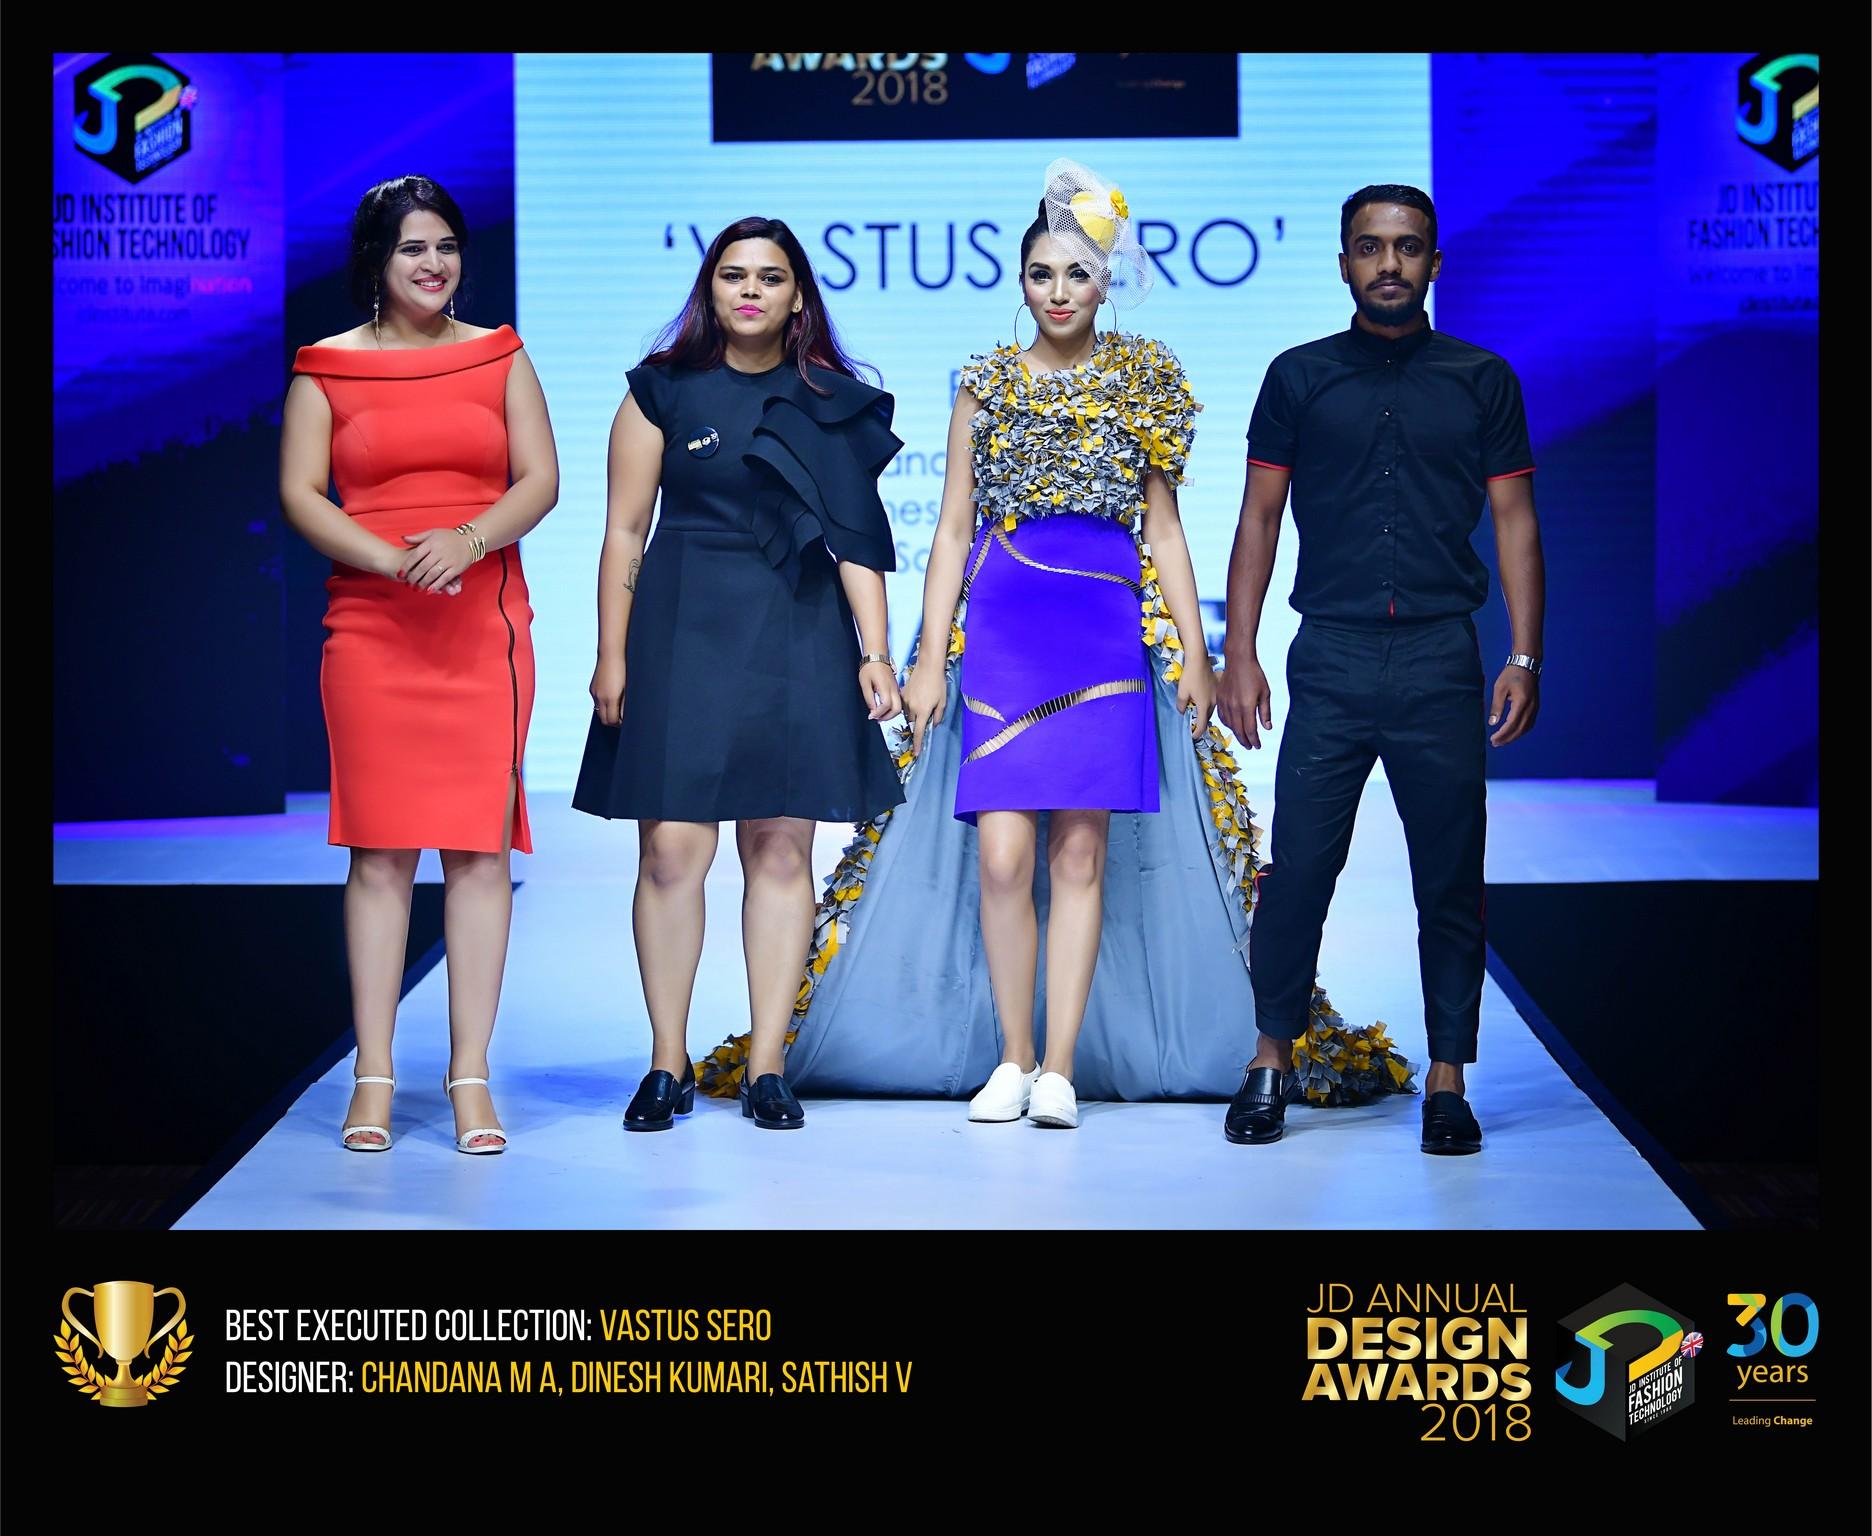 Vastus Sero – Change – JD Annual Design Awards 2018   Designer: Chandana, Dinesh and Sathish   Photography : Jerin Nath (@jerin_nath) vastus sero - VASTUS SERO9 final - Vastus Sero – Change – JD Annual Design Awards 2018